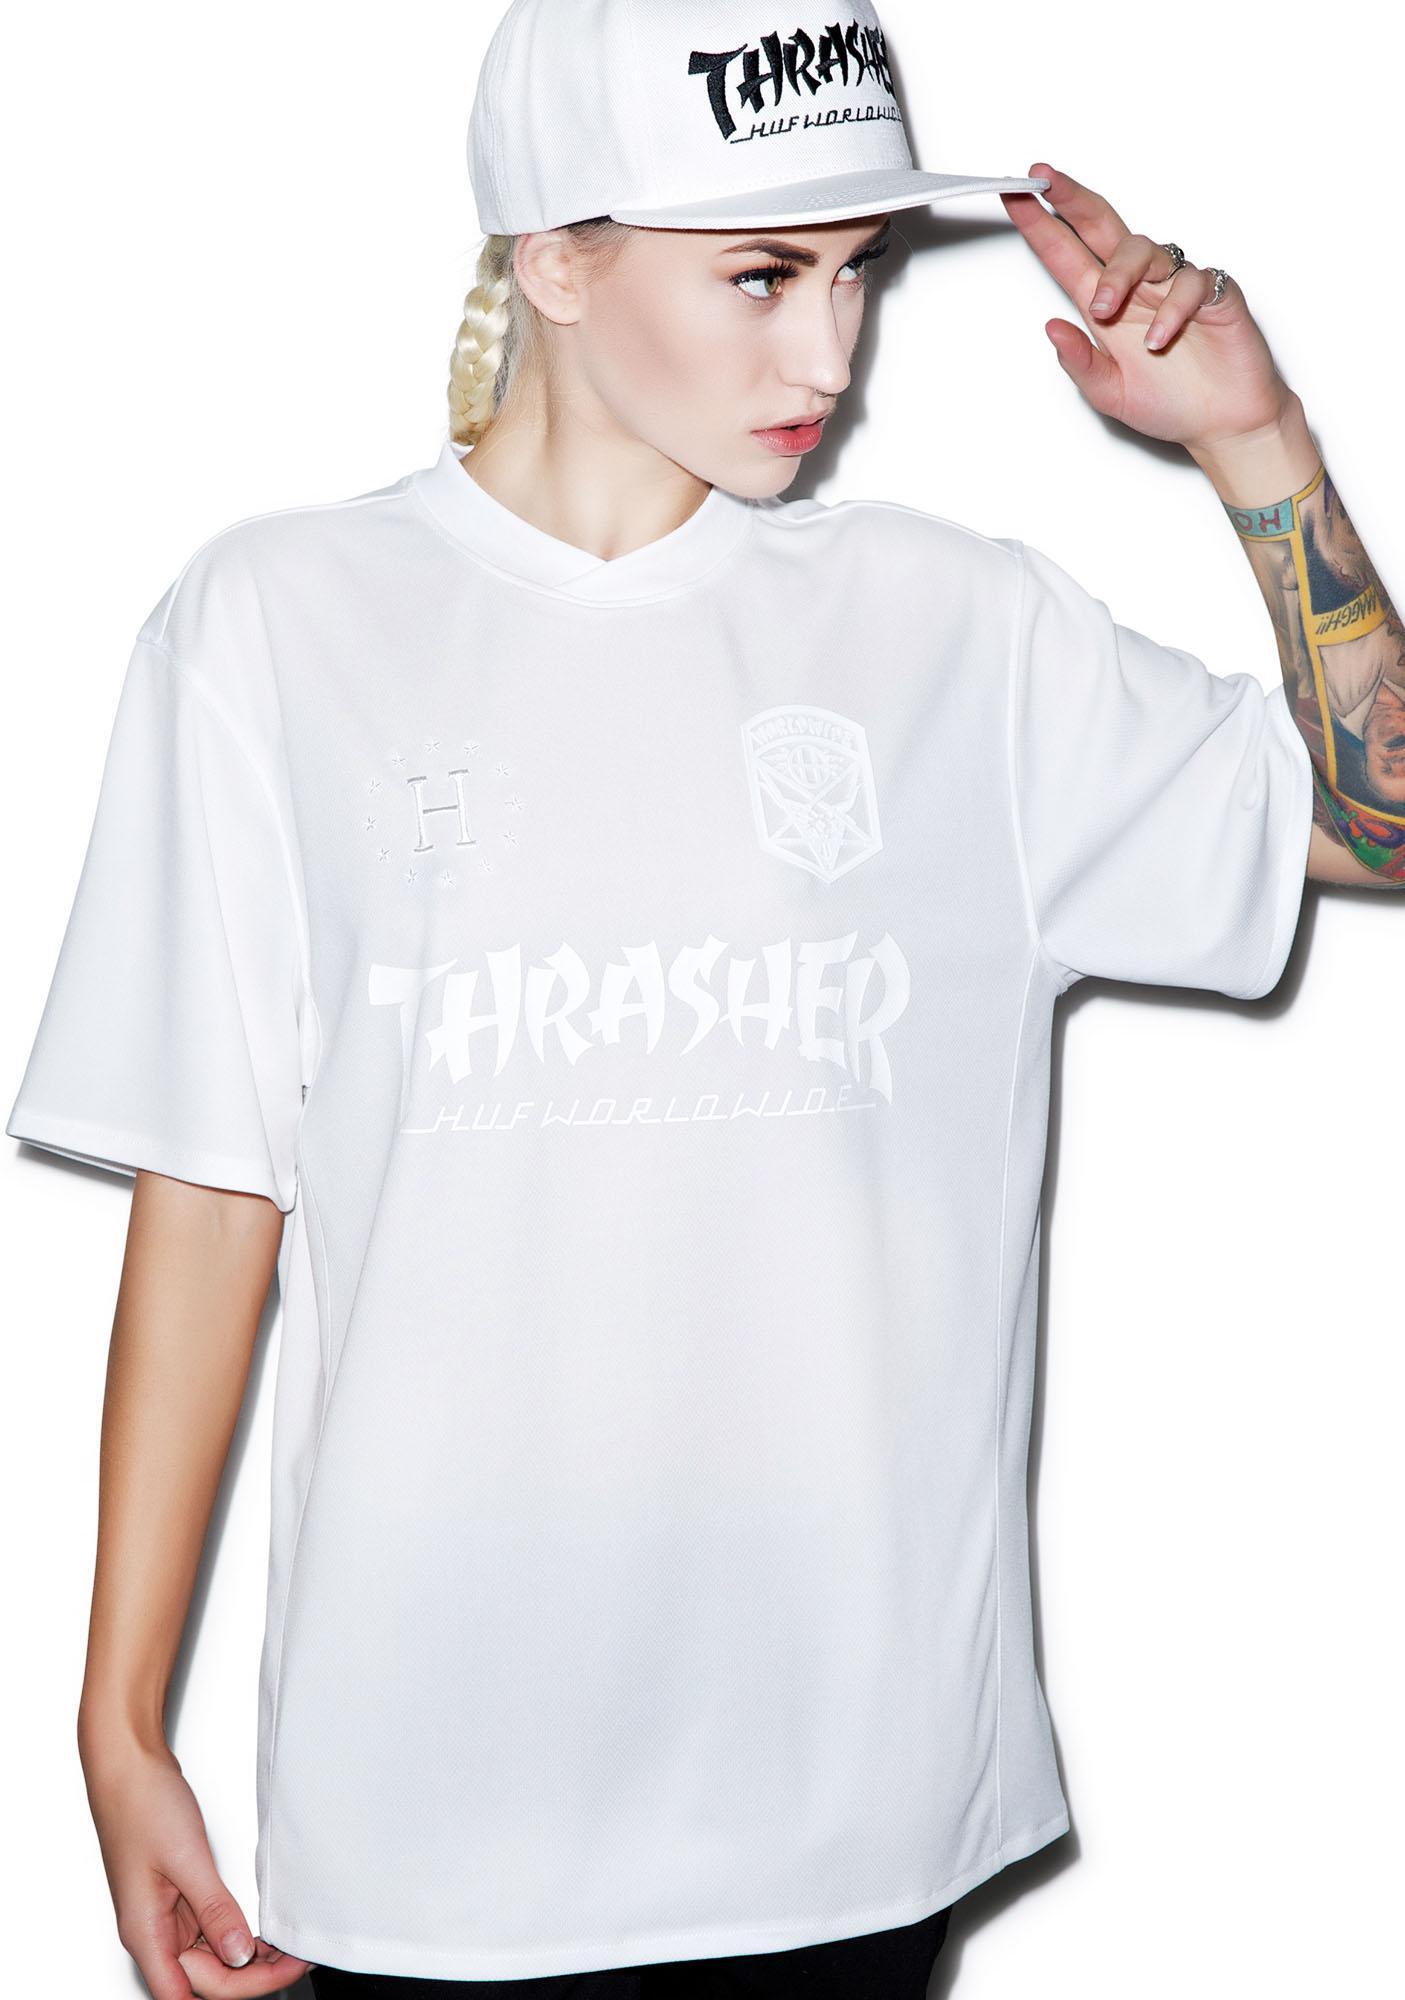 HUF HUF X Thrasher Soccer Jersey 2.0